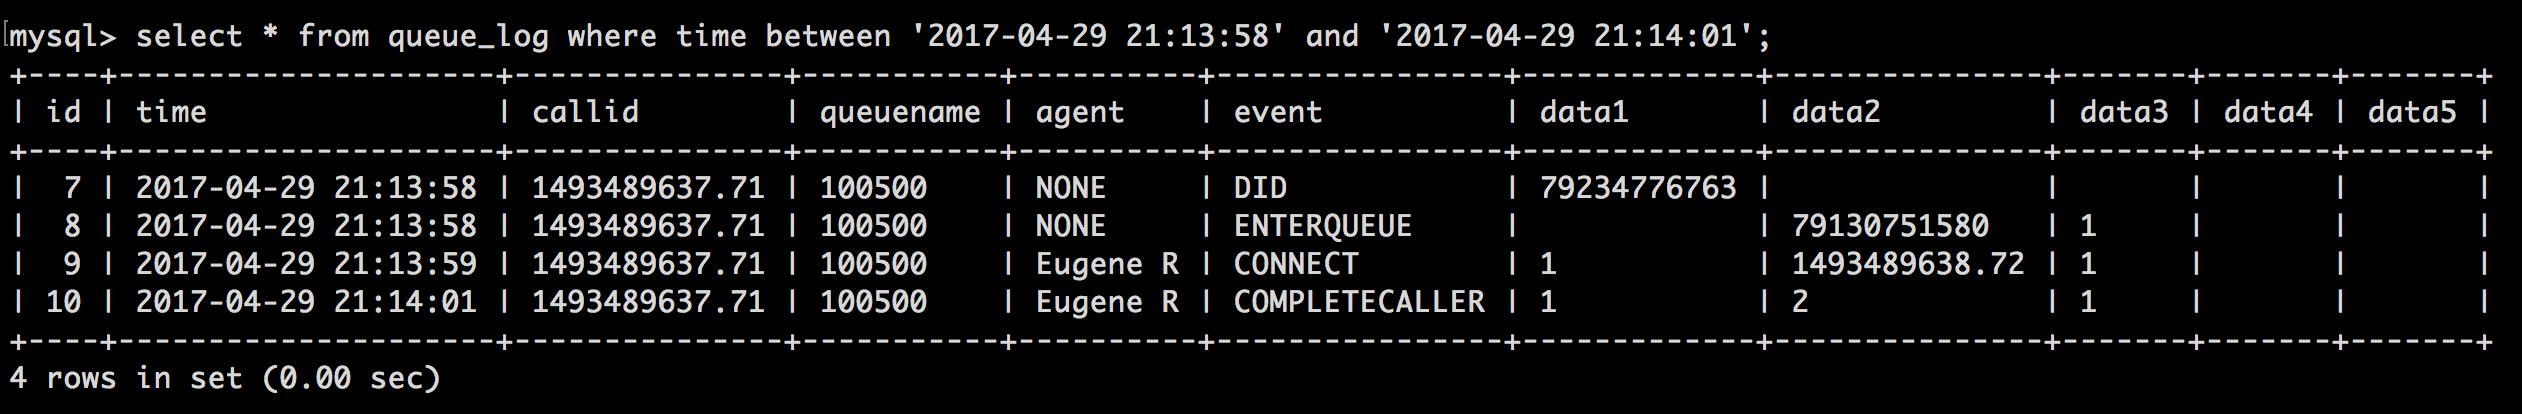 configure_freepbx_for_cloud_version [Система статистики работы call